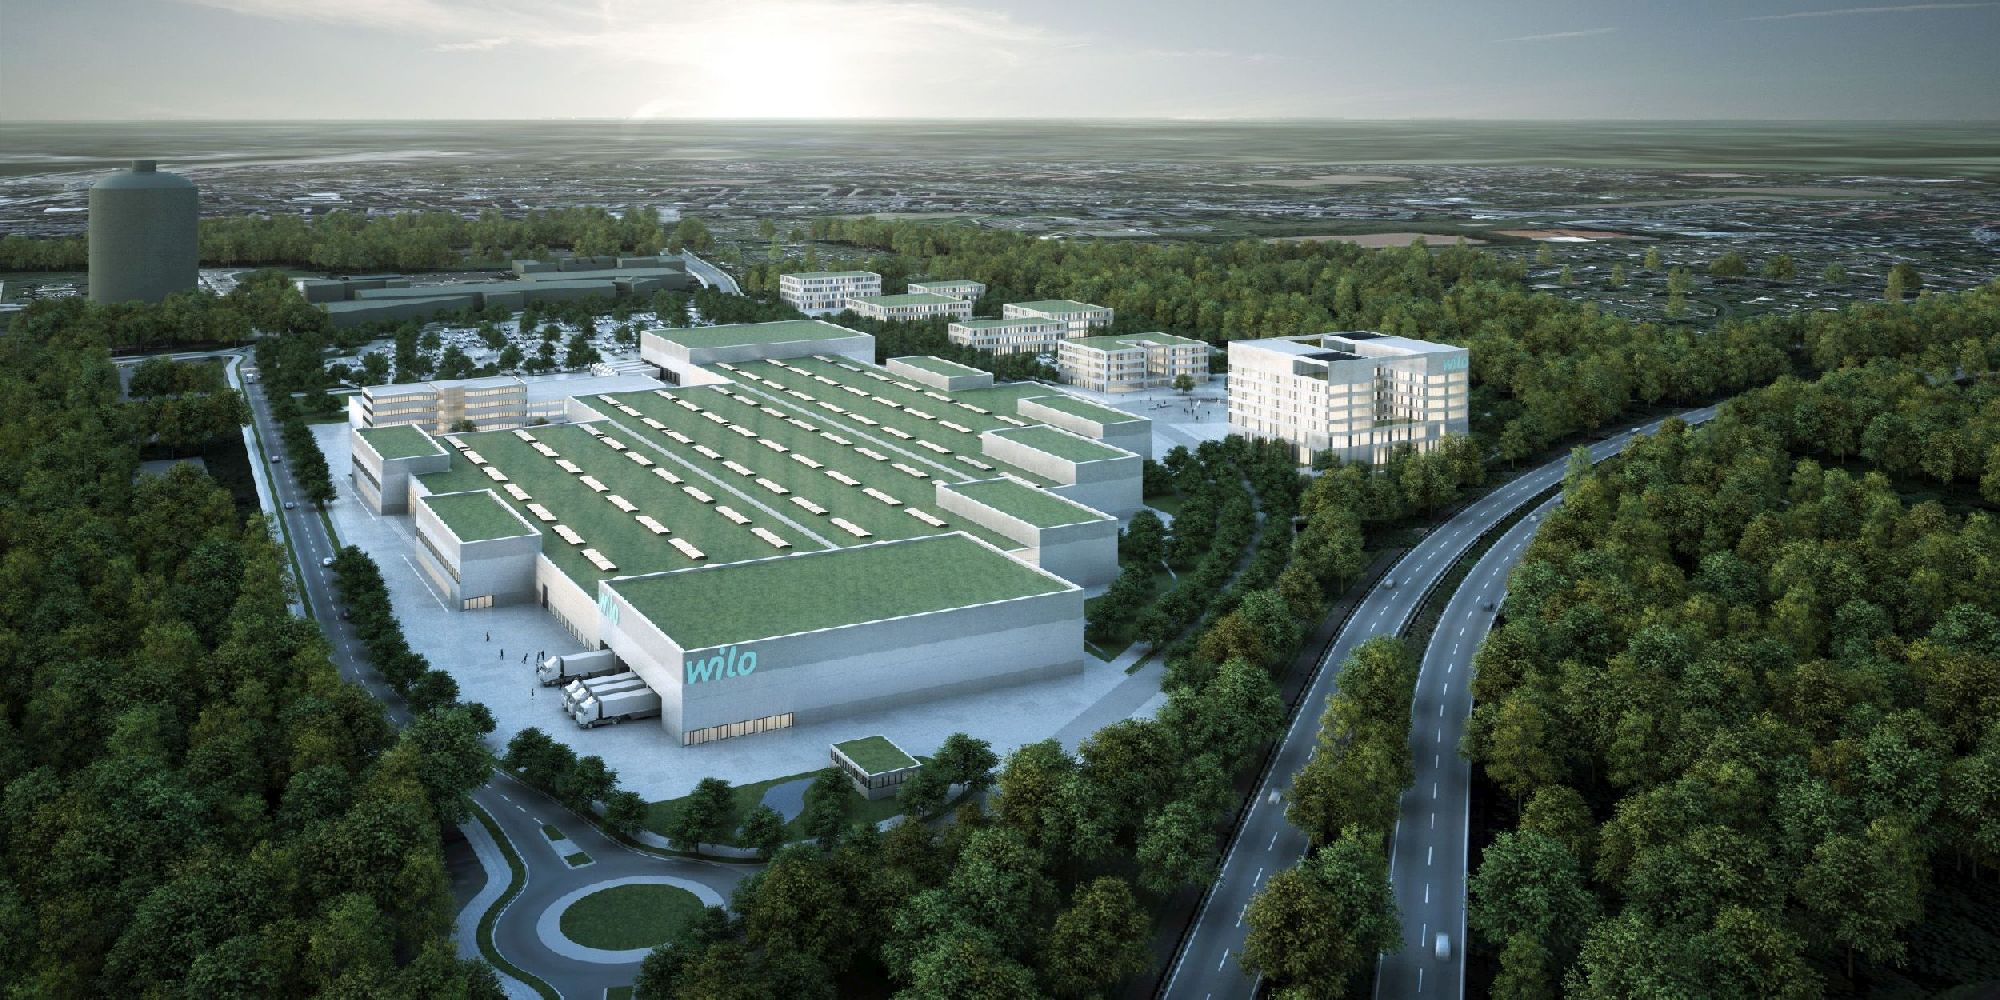 Produktionshalle, Wilo Smart Factory, Dortmund